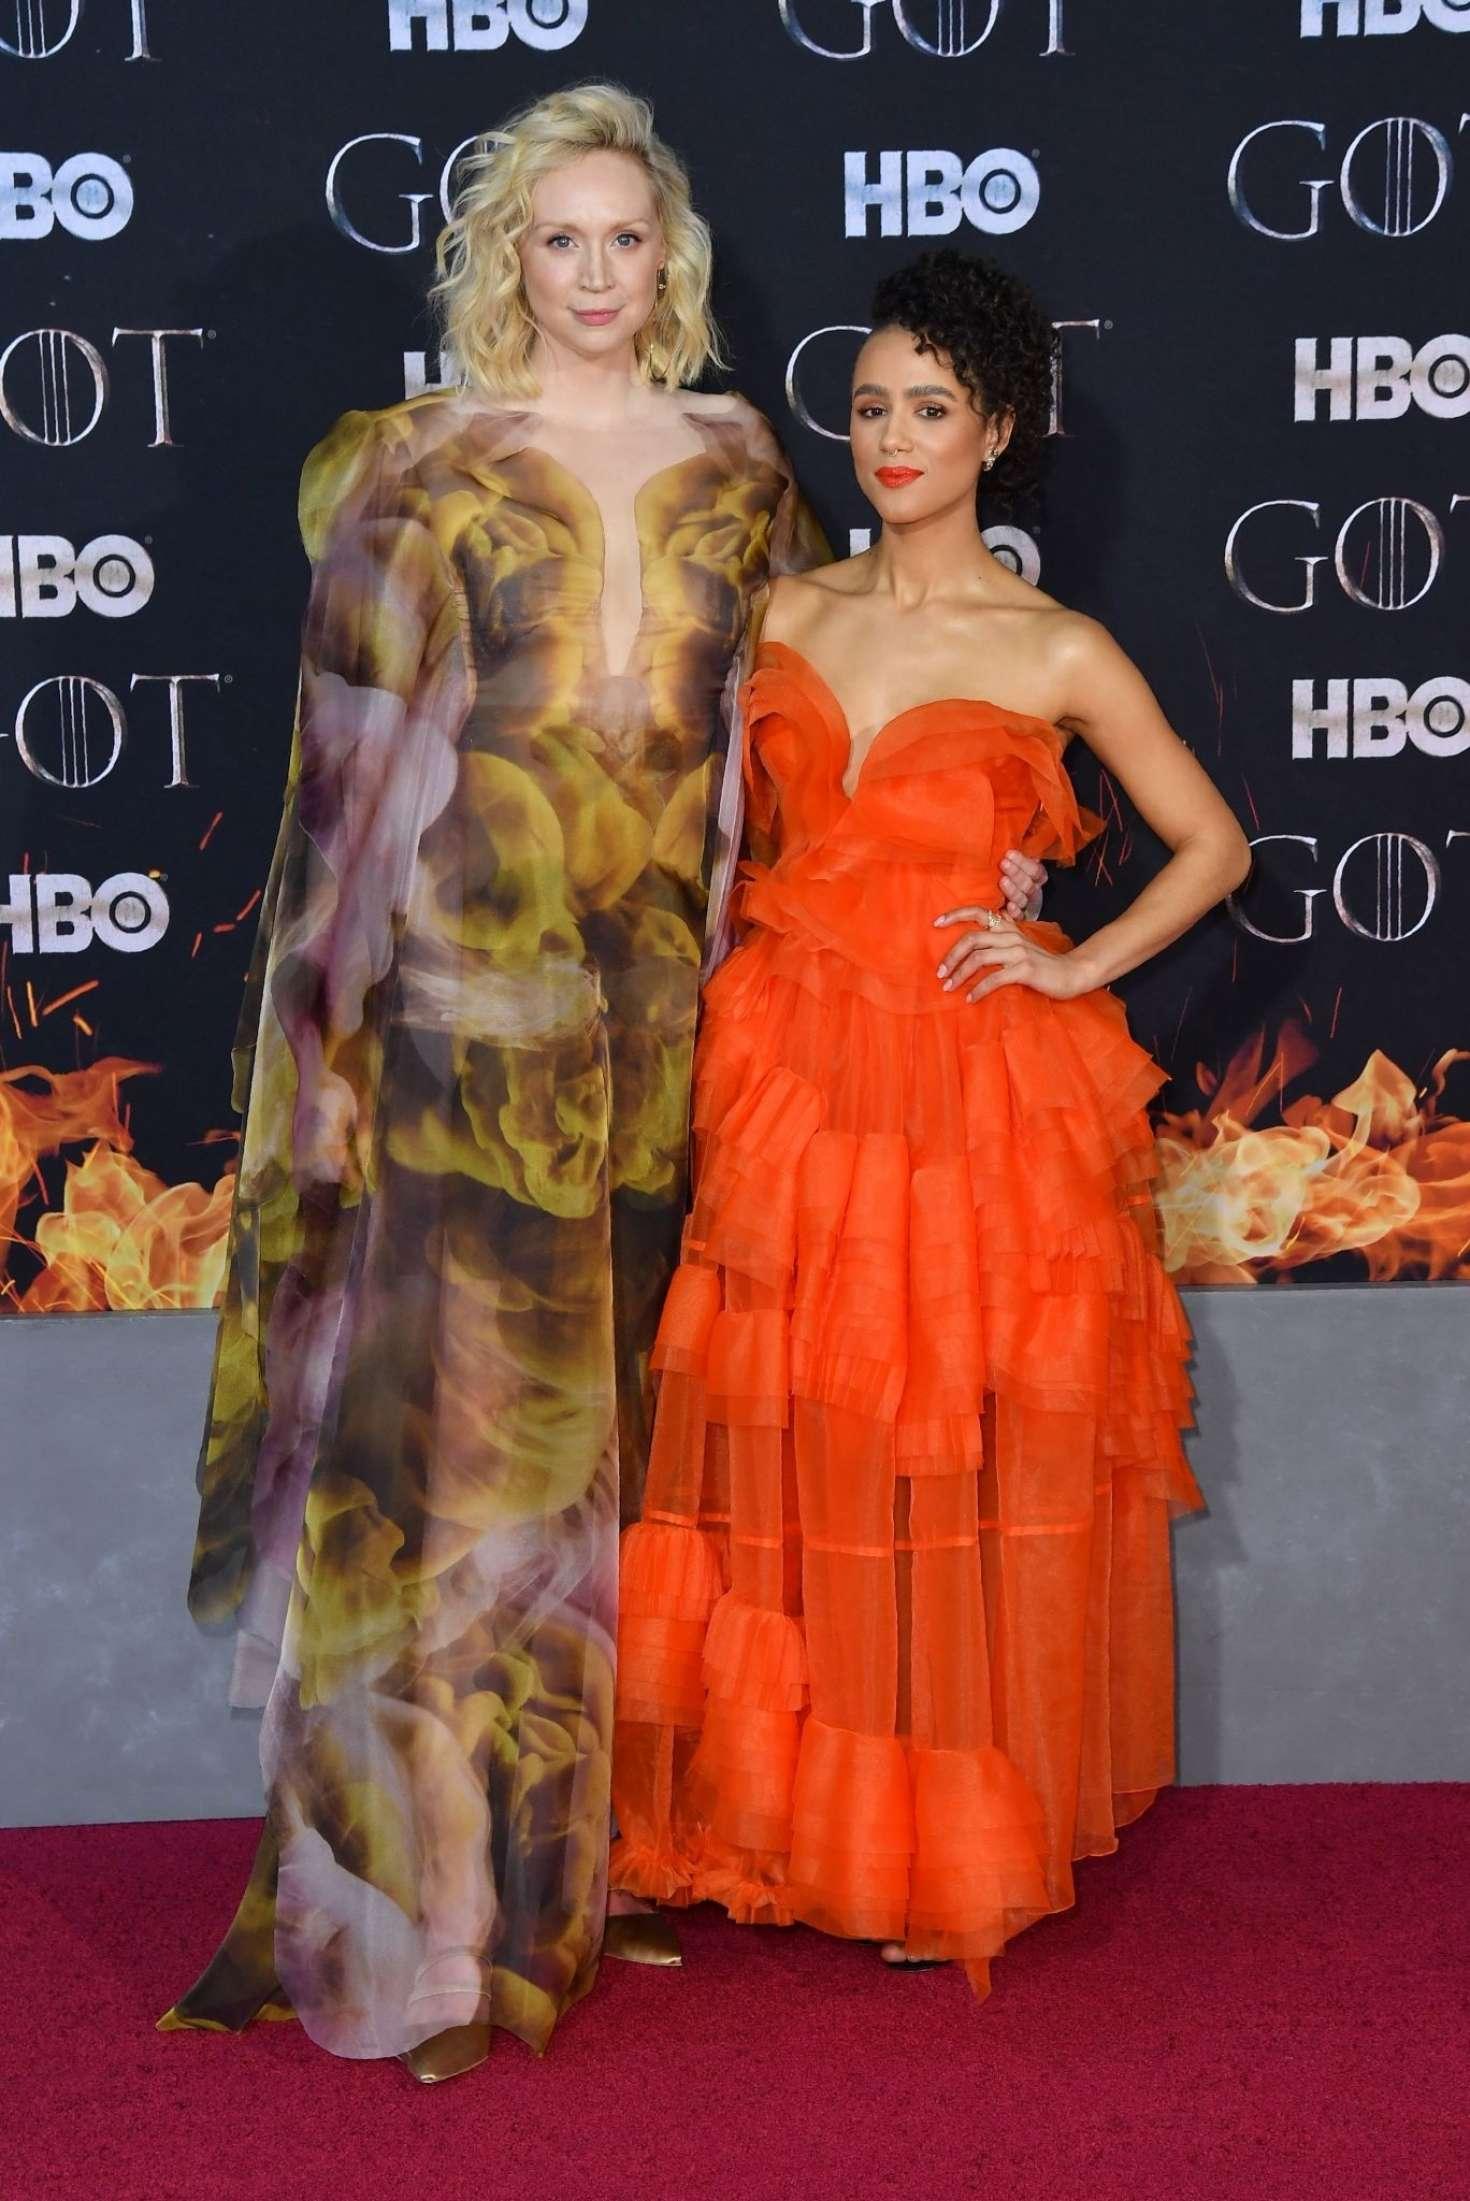 Nathalie Emmanuel 2019 : Nathalie Emmanuel: Game of Thrones Season 8 Premiere -10